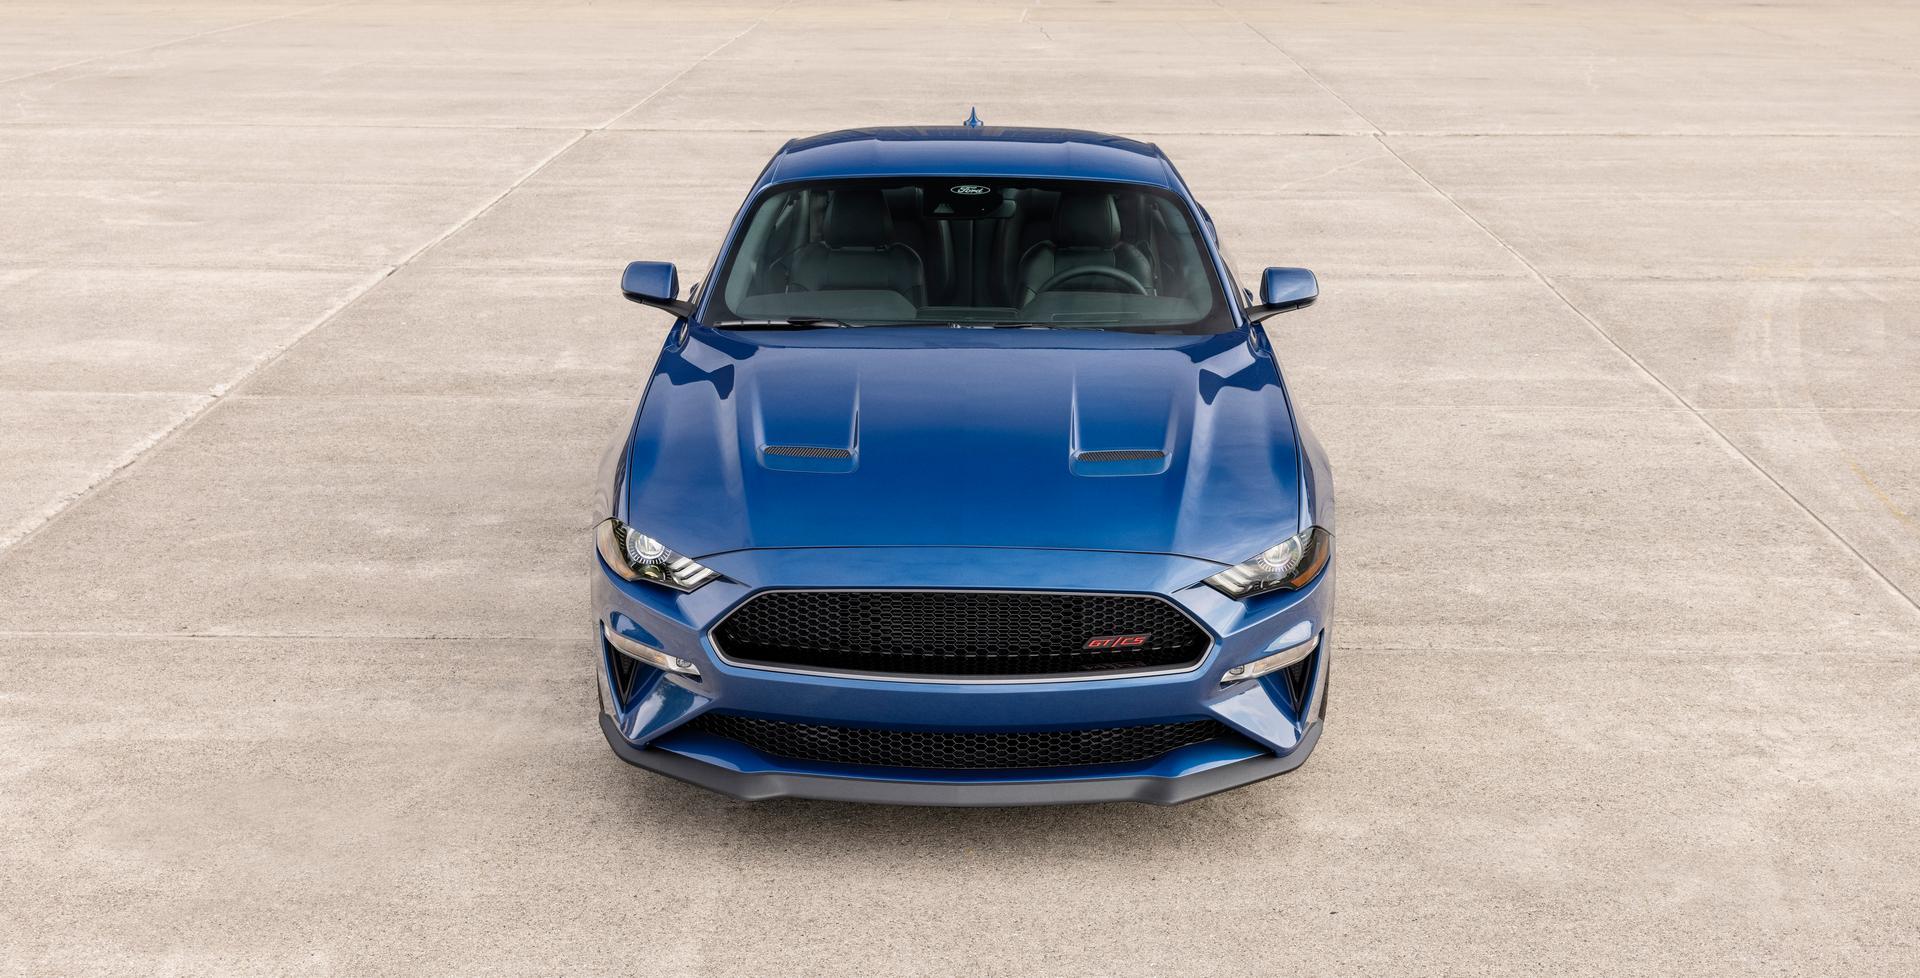 2022 Mustang GT California Special